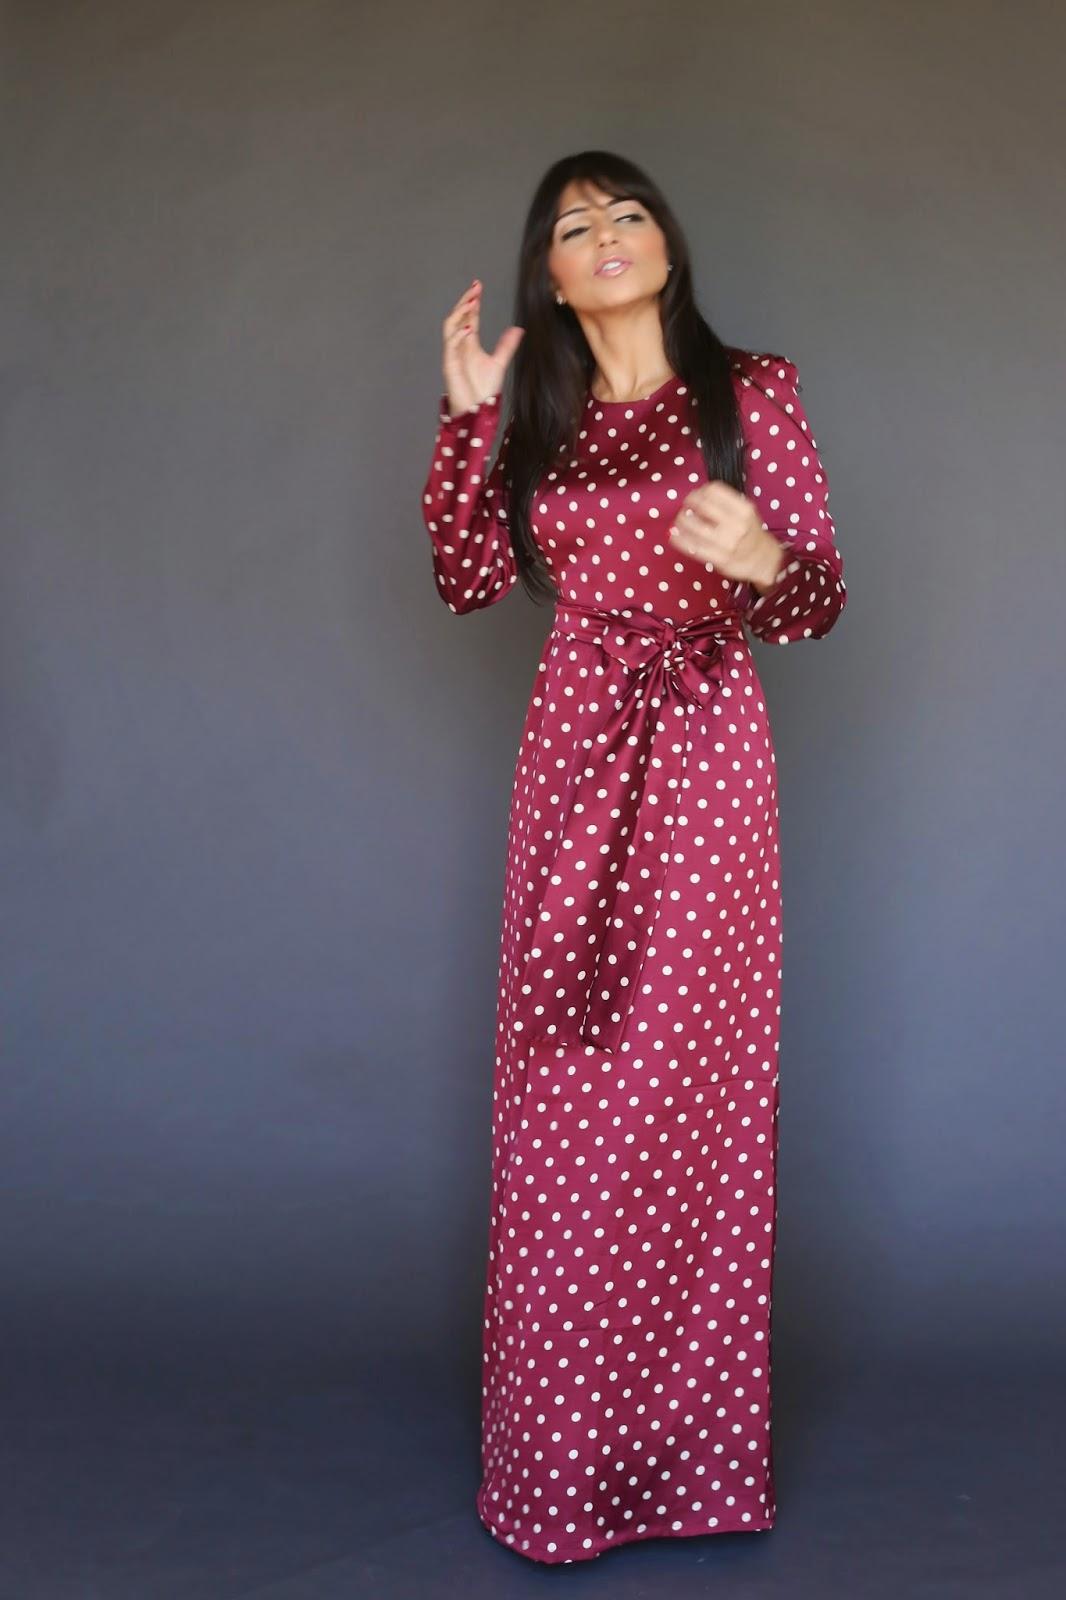 red polk a dot maxi dress with long sleeves modest style fashion hijab tznius islamic kosher Mode-sty